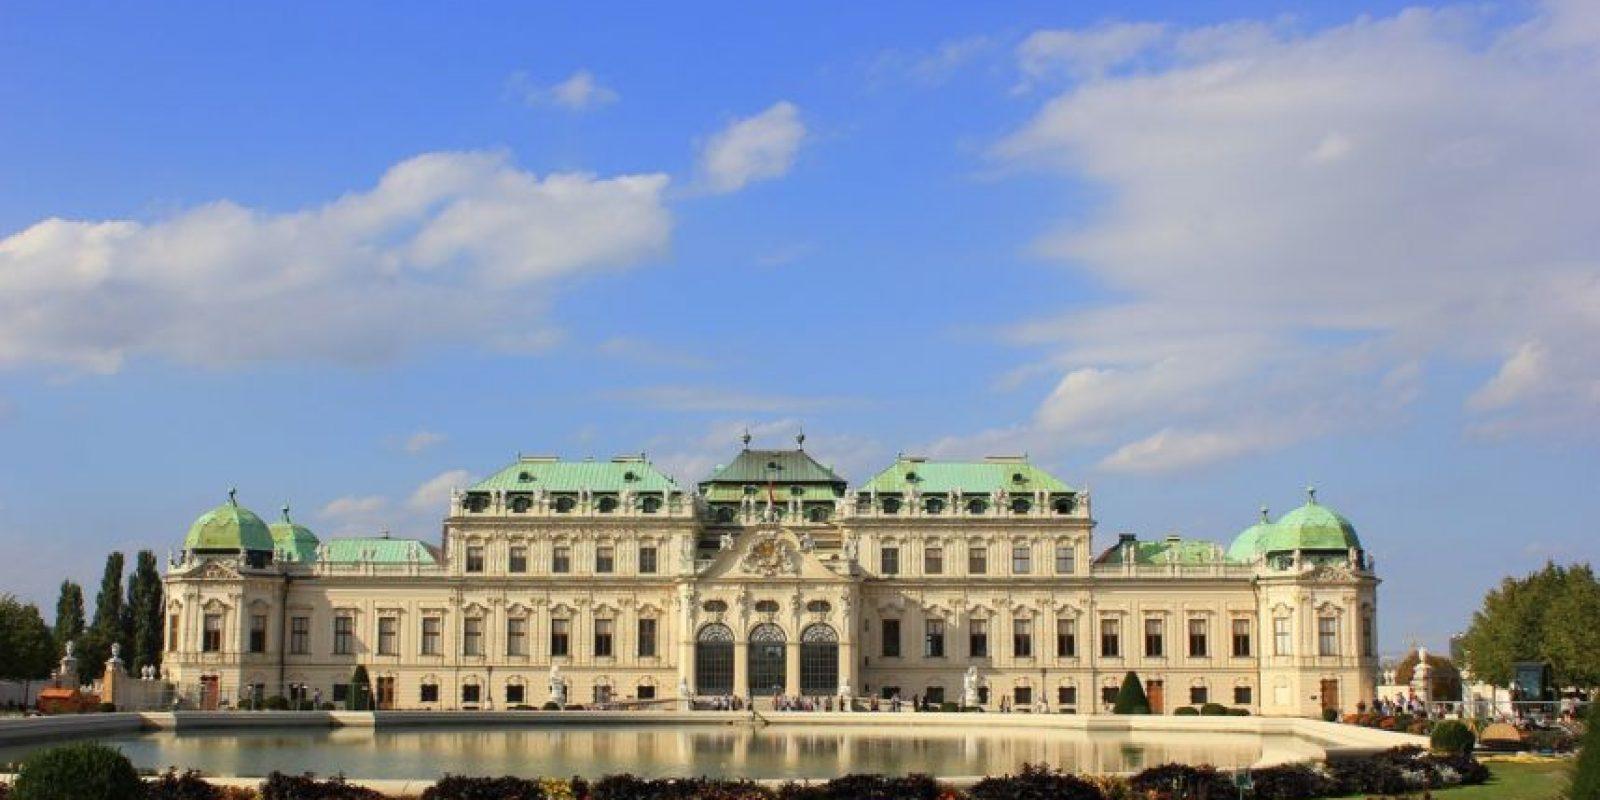 Palacio Belvedere. Hoy en día alberga un museo de arte. Foto:Wikipedia Commons